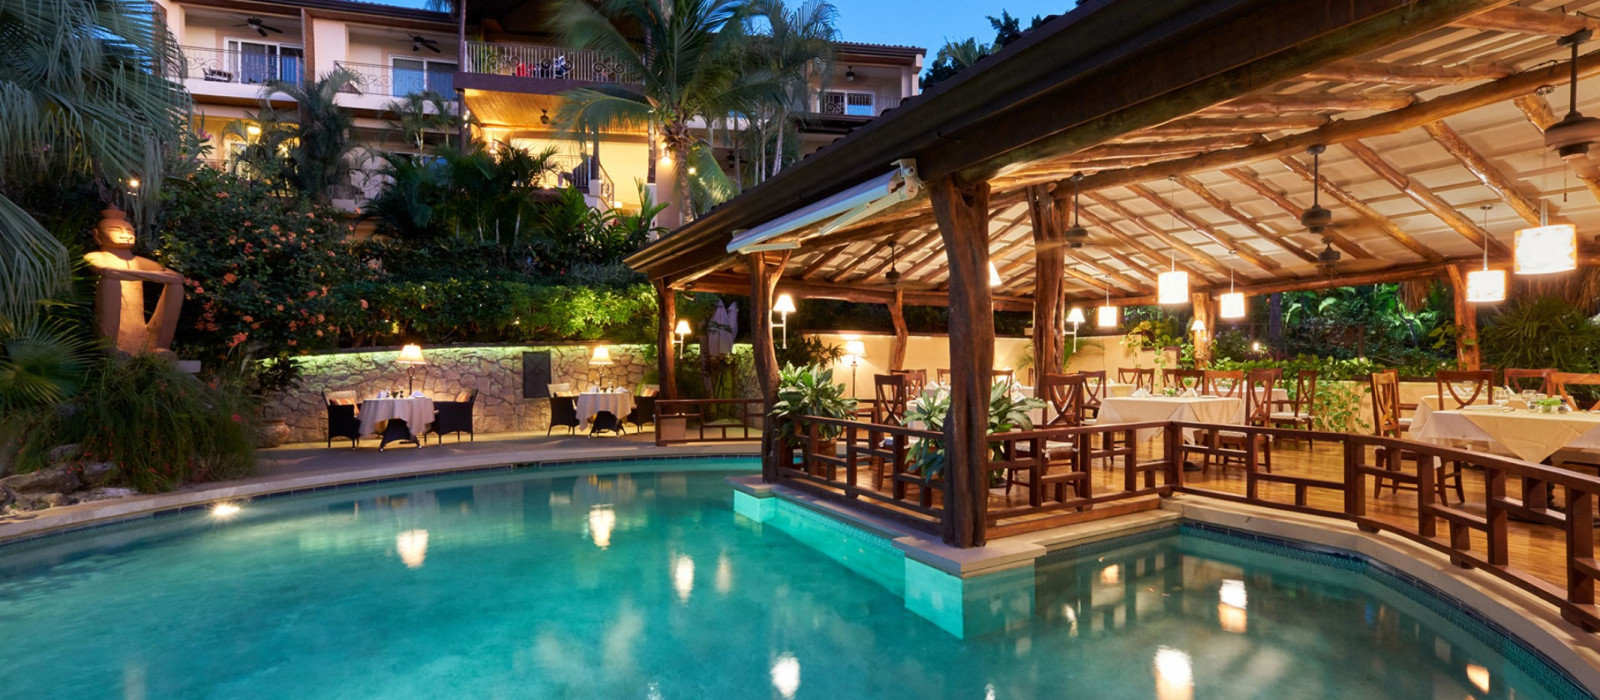 Hotel Jardin del Eden Boutique  Costa Rica